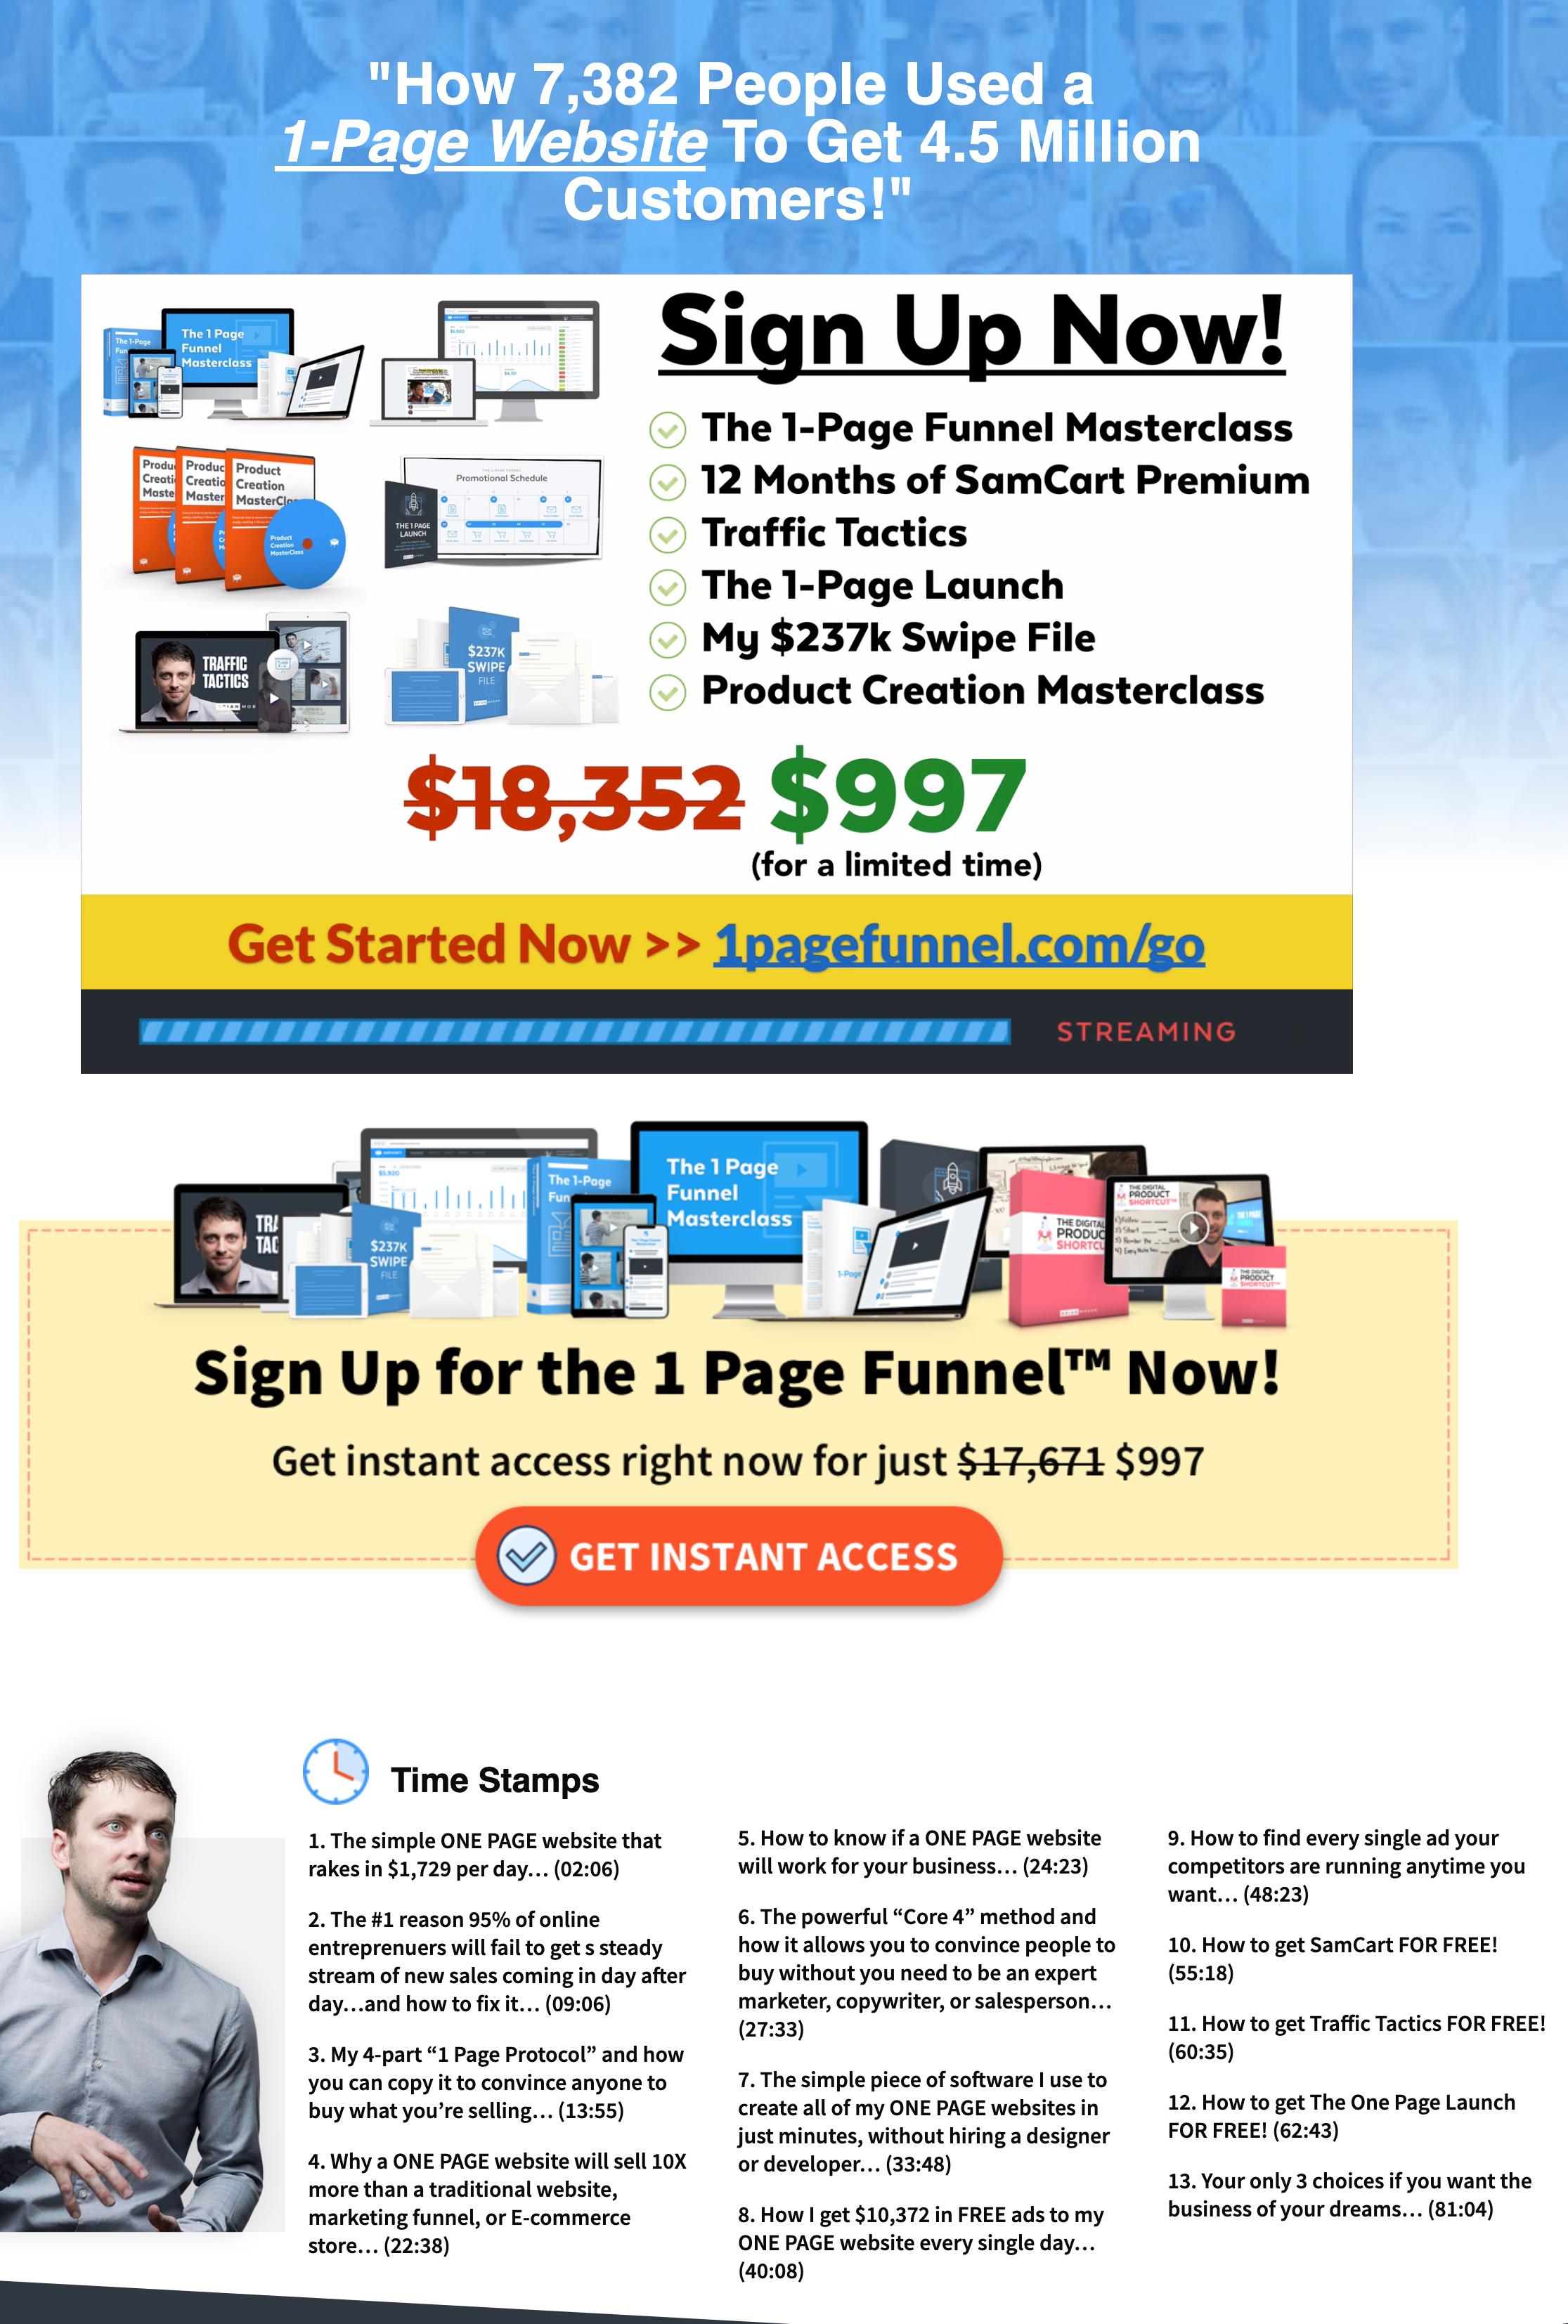 Brian Moran - 1-Page Funnel Master Class Download